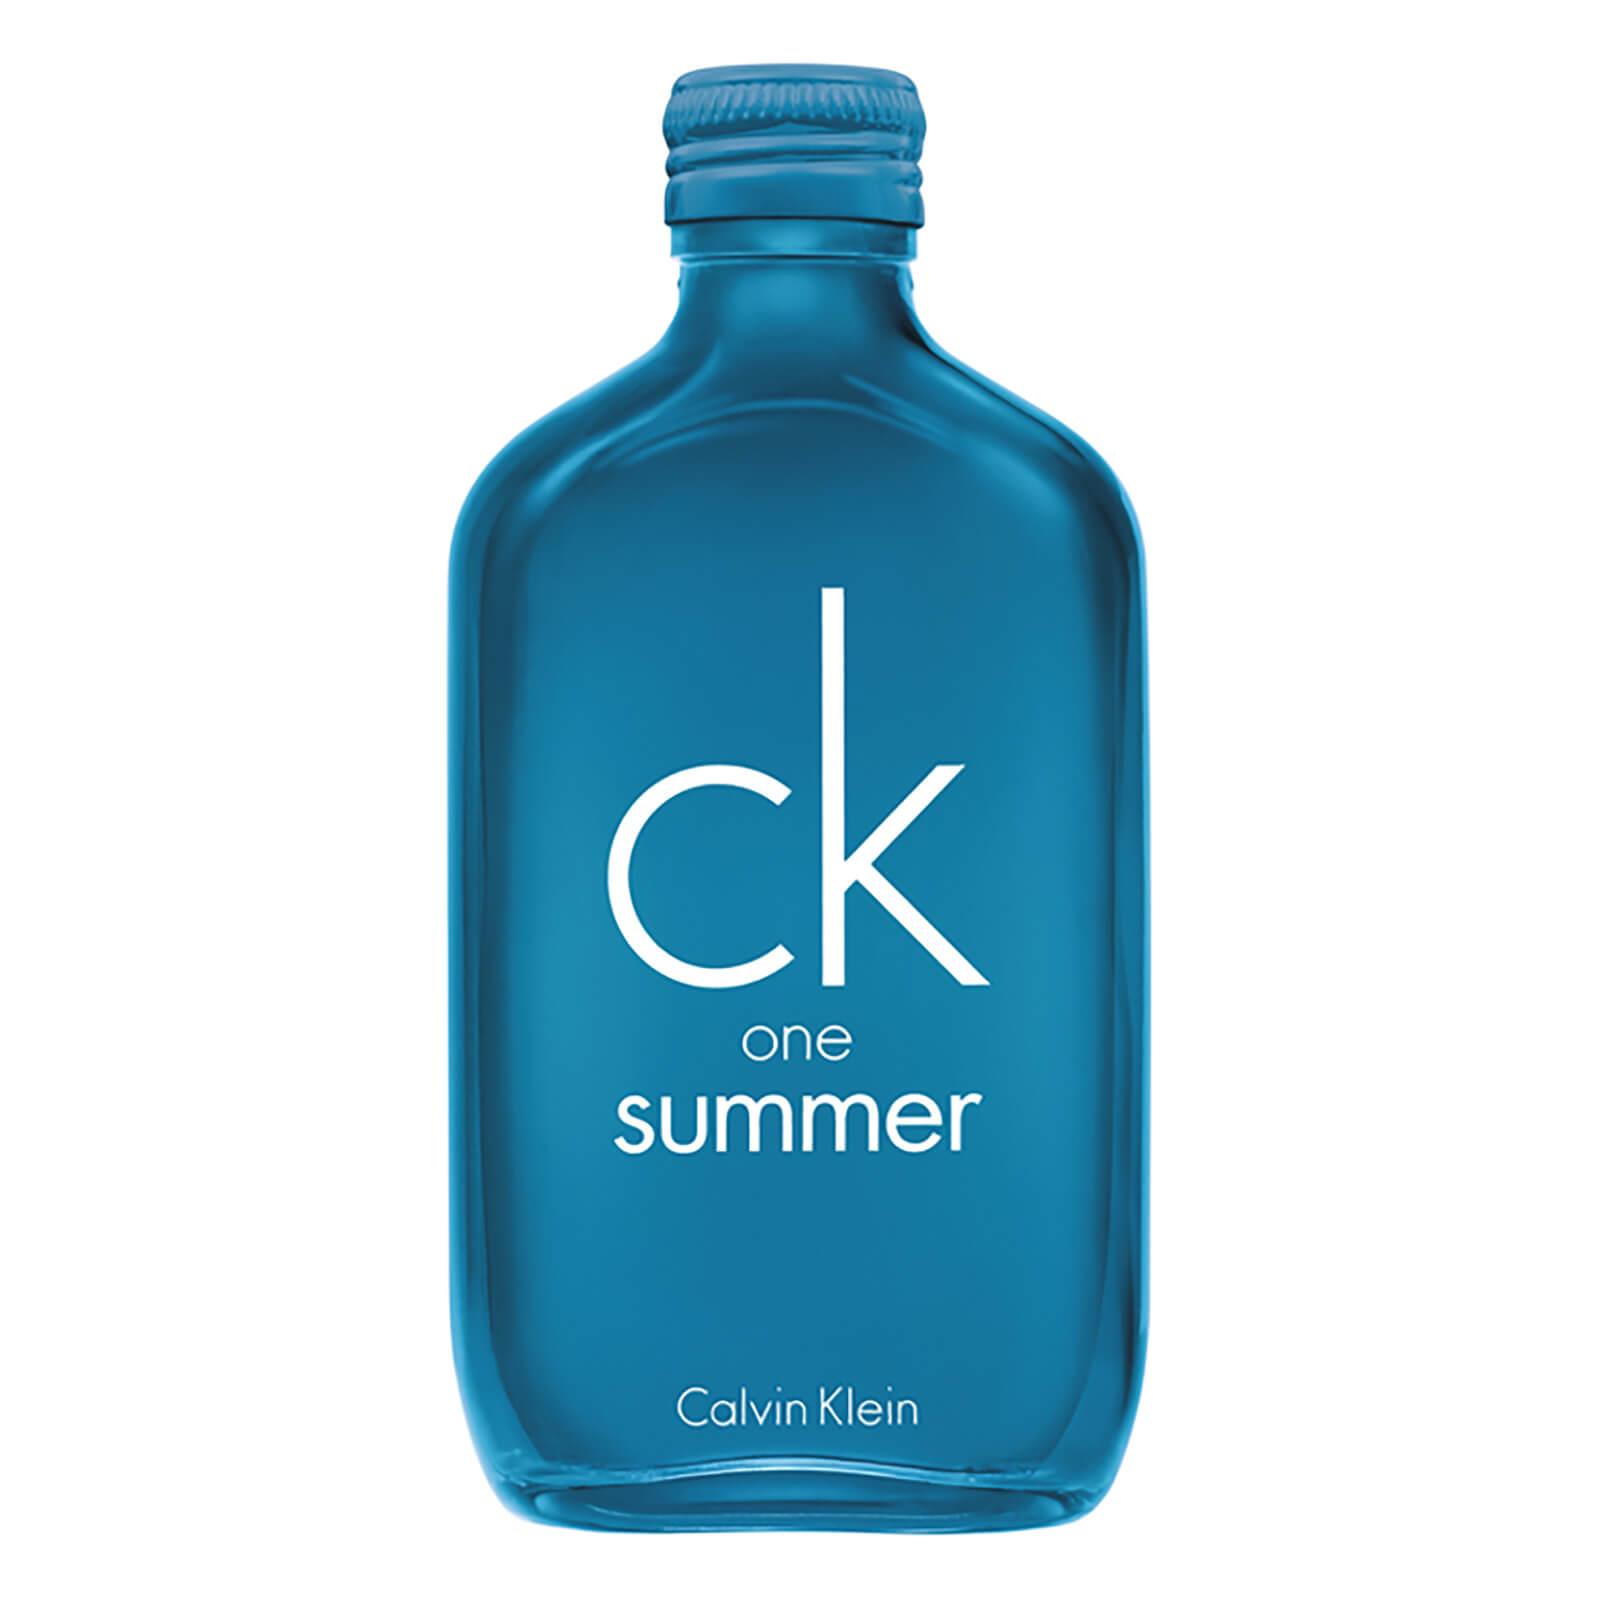 26440e99e4645 Calvin Klein CK One Summer Eau de Toilette 100ml   Free Shipping    Lookfantastic